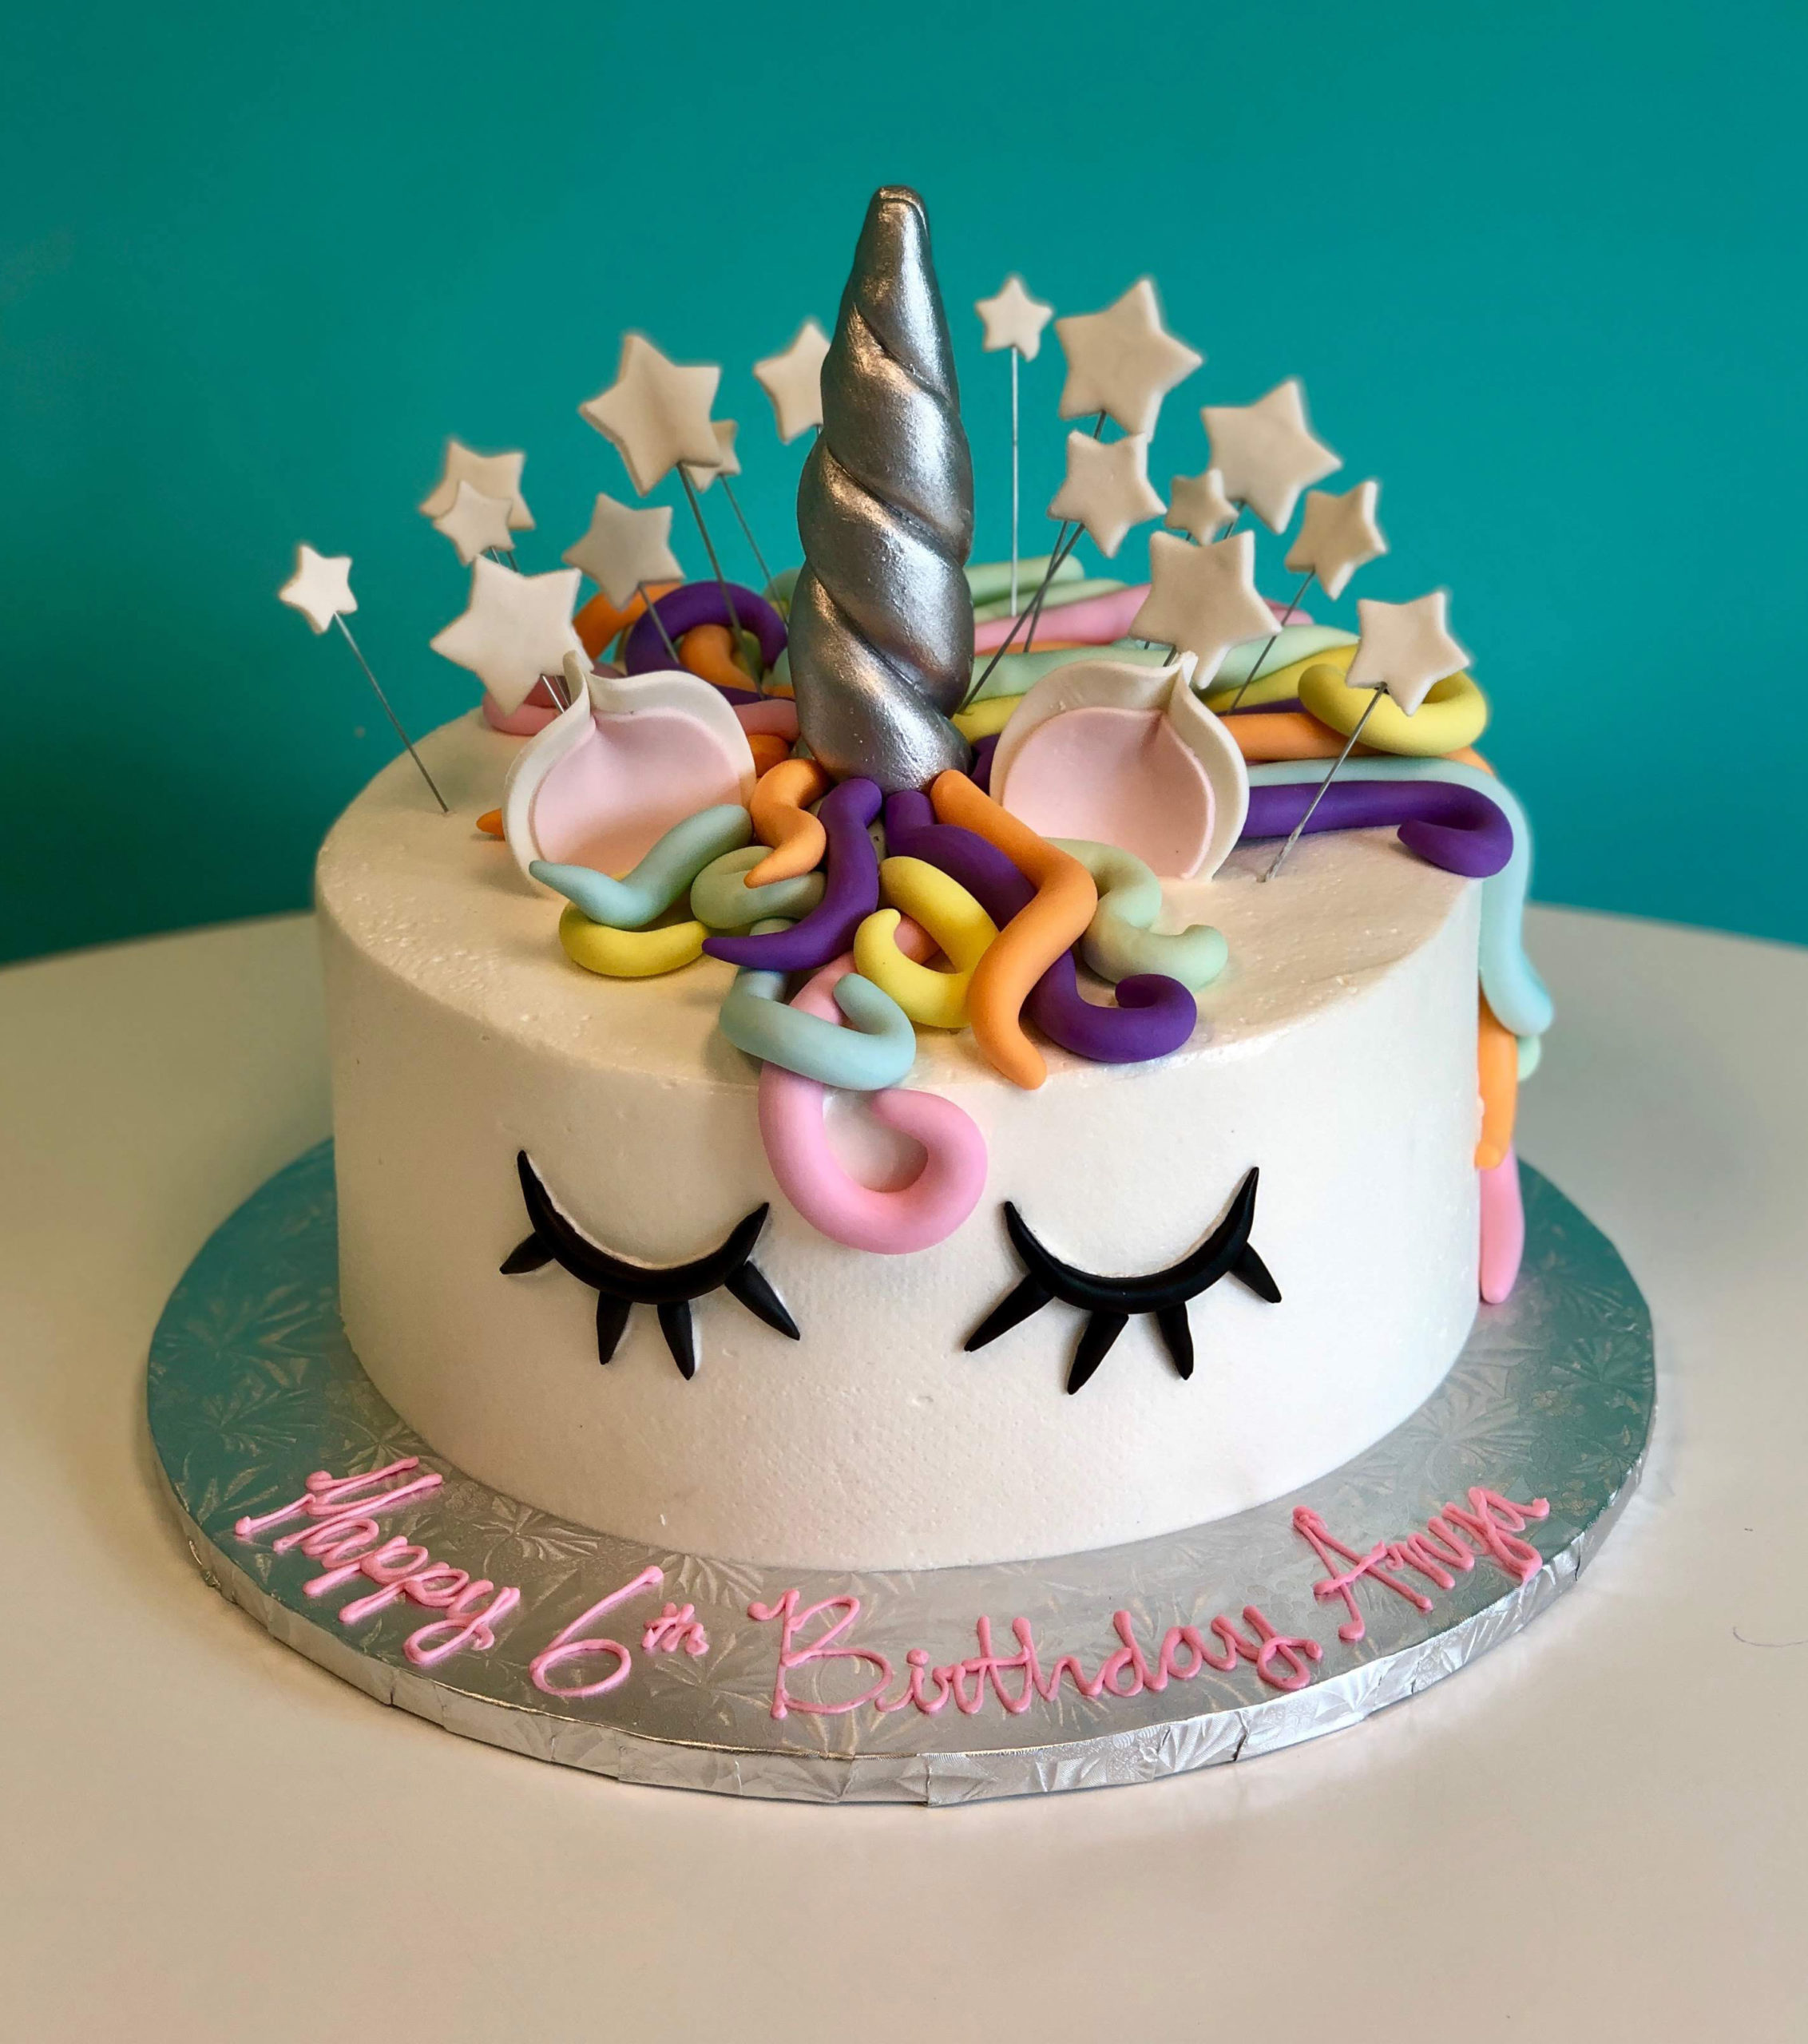 Excellent Custom General Kids Birthday Cakes Carousel Cakes Funny Birthday Cards Online Alyptdamsfinfo